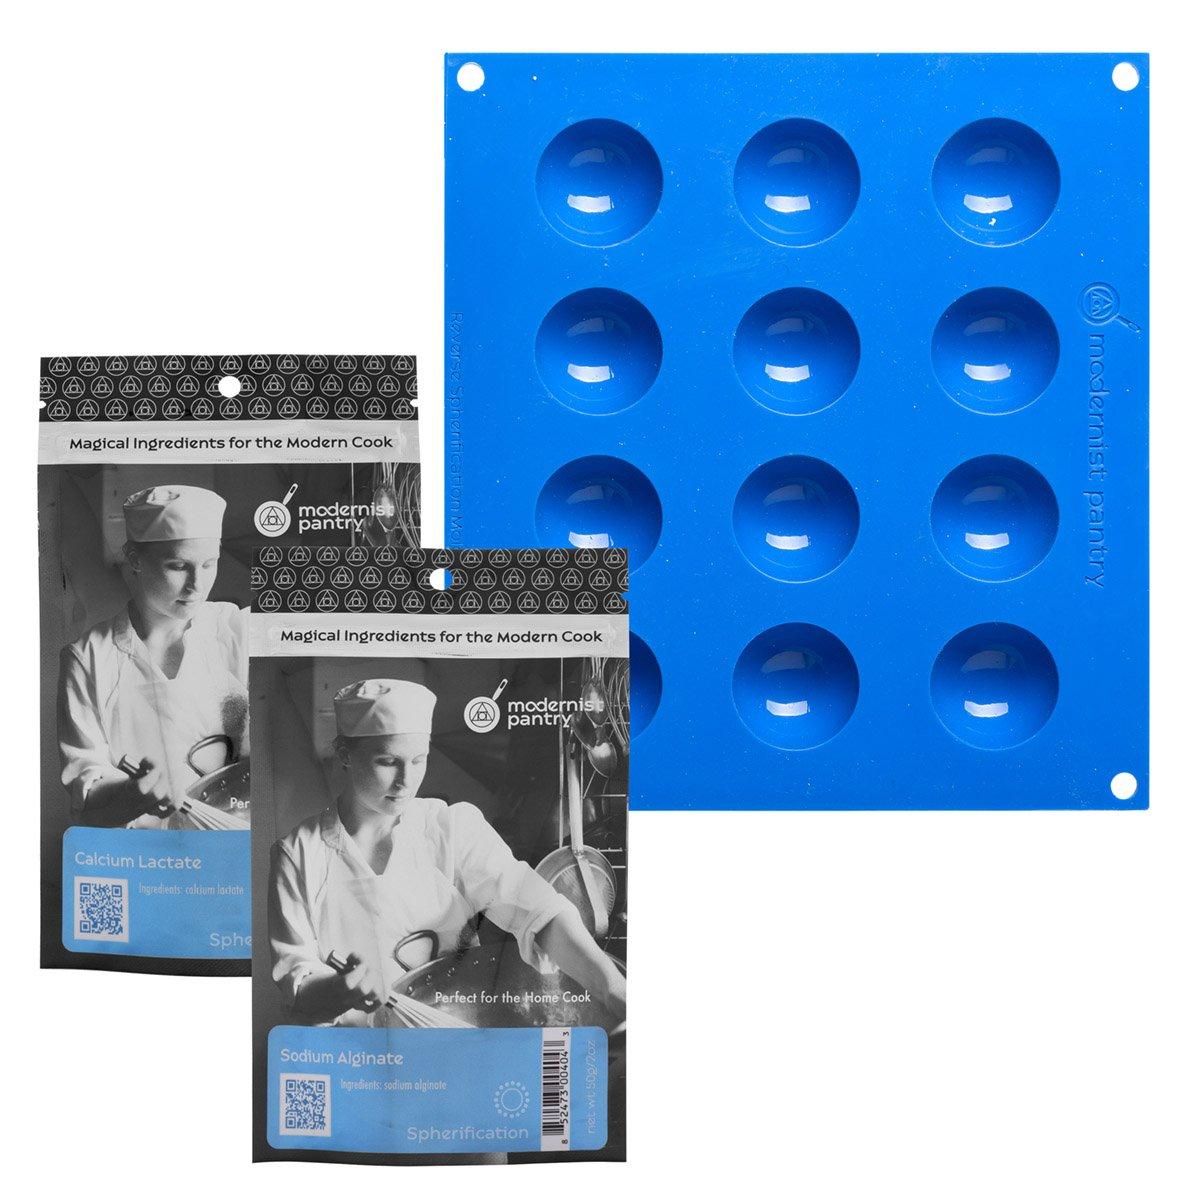 Reverse Spherification Kit (Molecular Gastronomy) ⊘ Non-GMO ❤ Gluten-Free ☮ Vegan ✡ OU Kosher Certified Ingredients